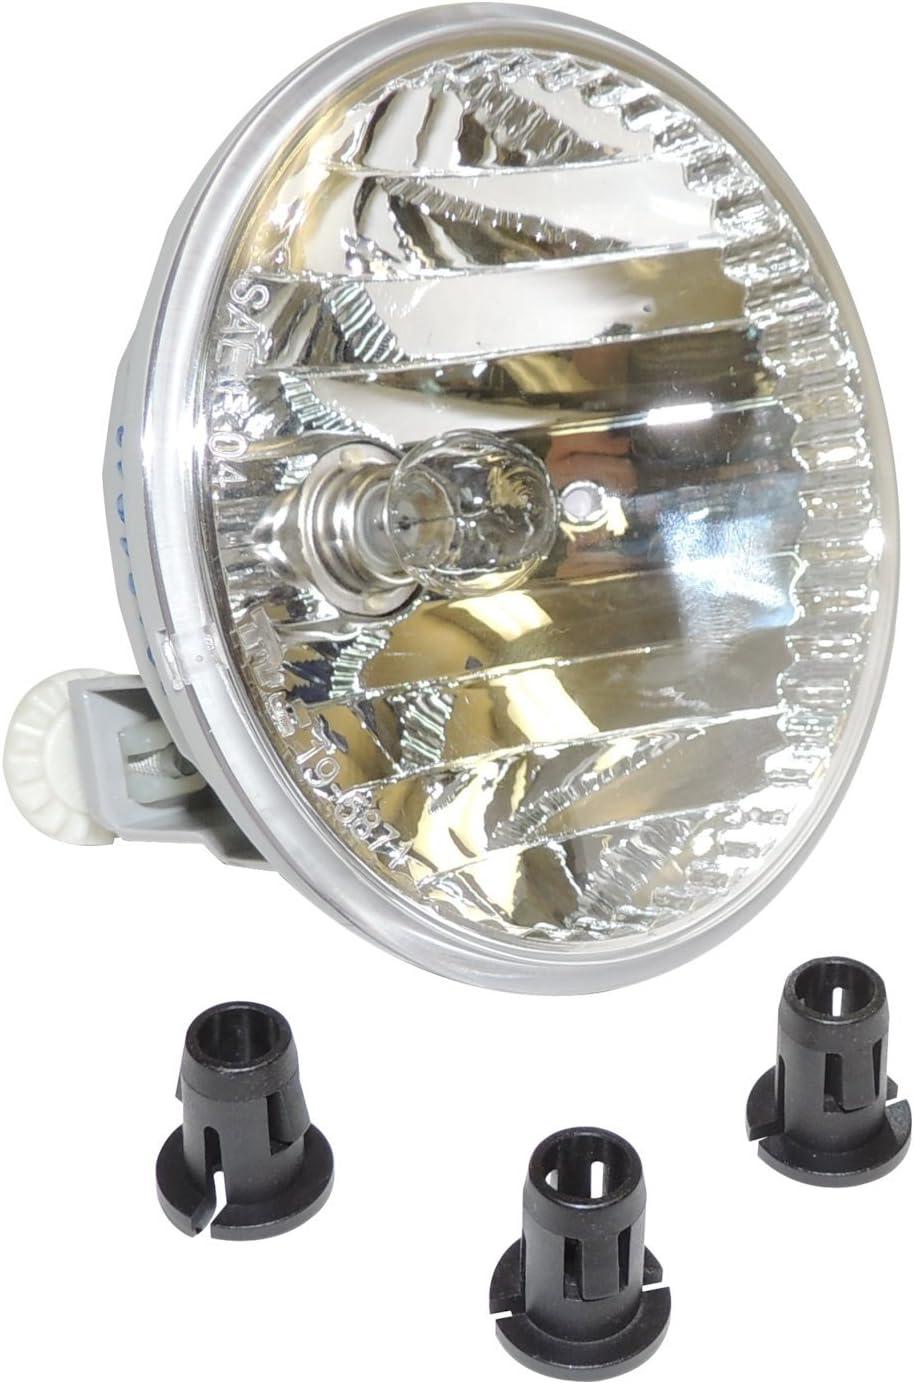 CROWN AUTO 57010717AC Lamp